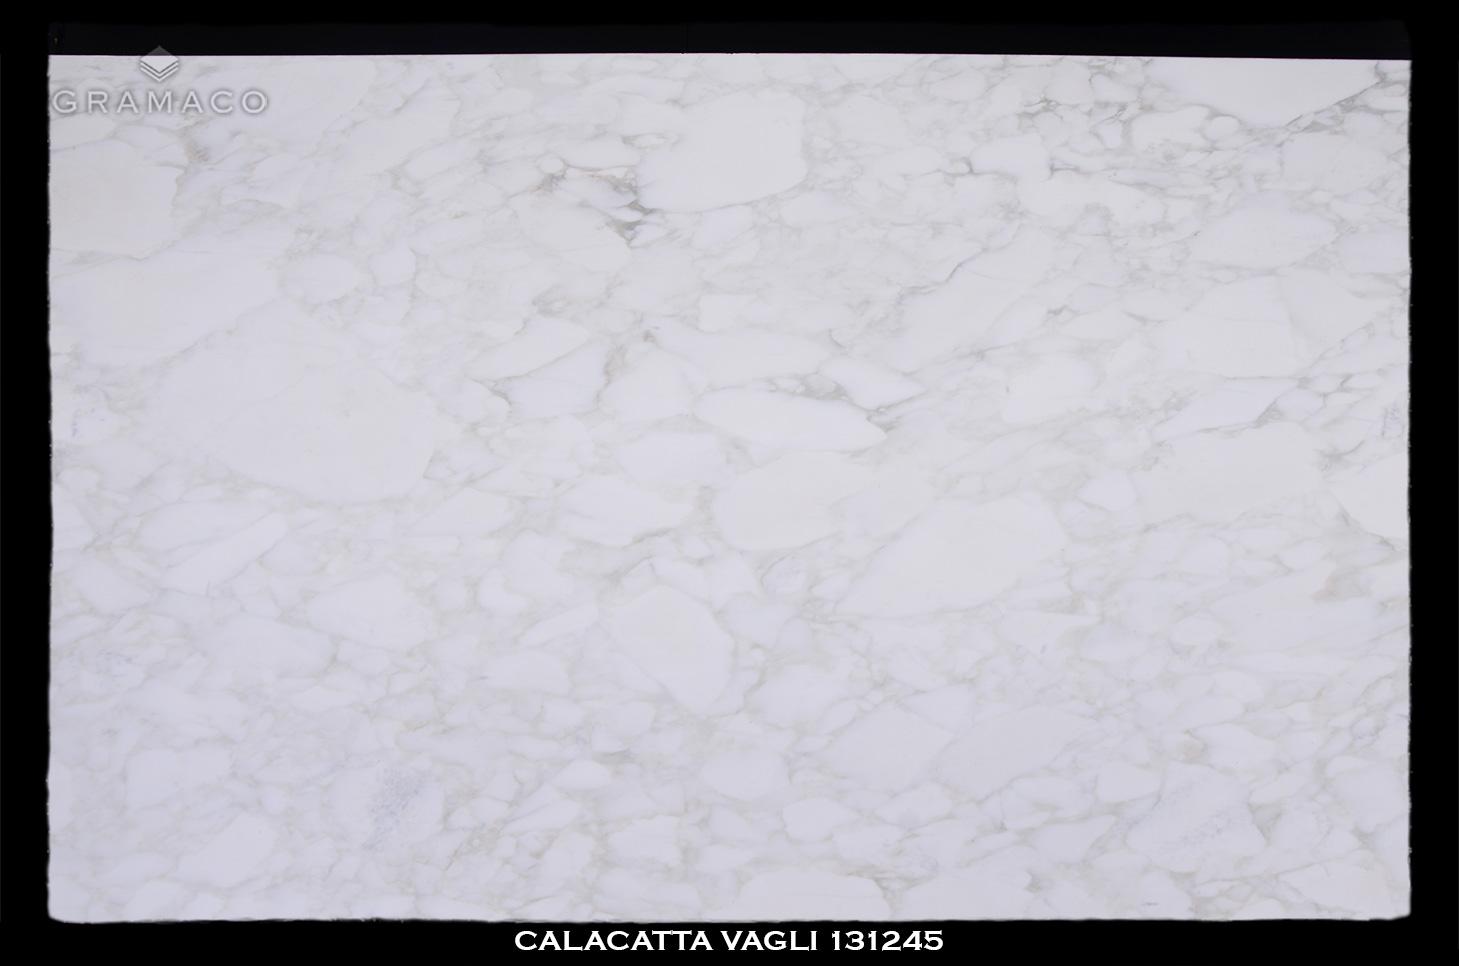 CALACATTA-VAGLI-131245-FULL-SLAB-BLACK